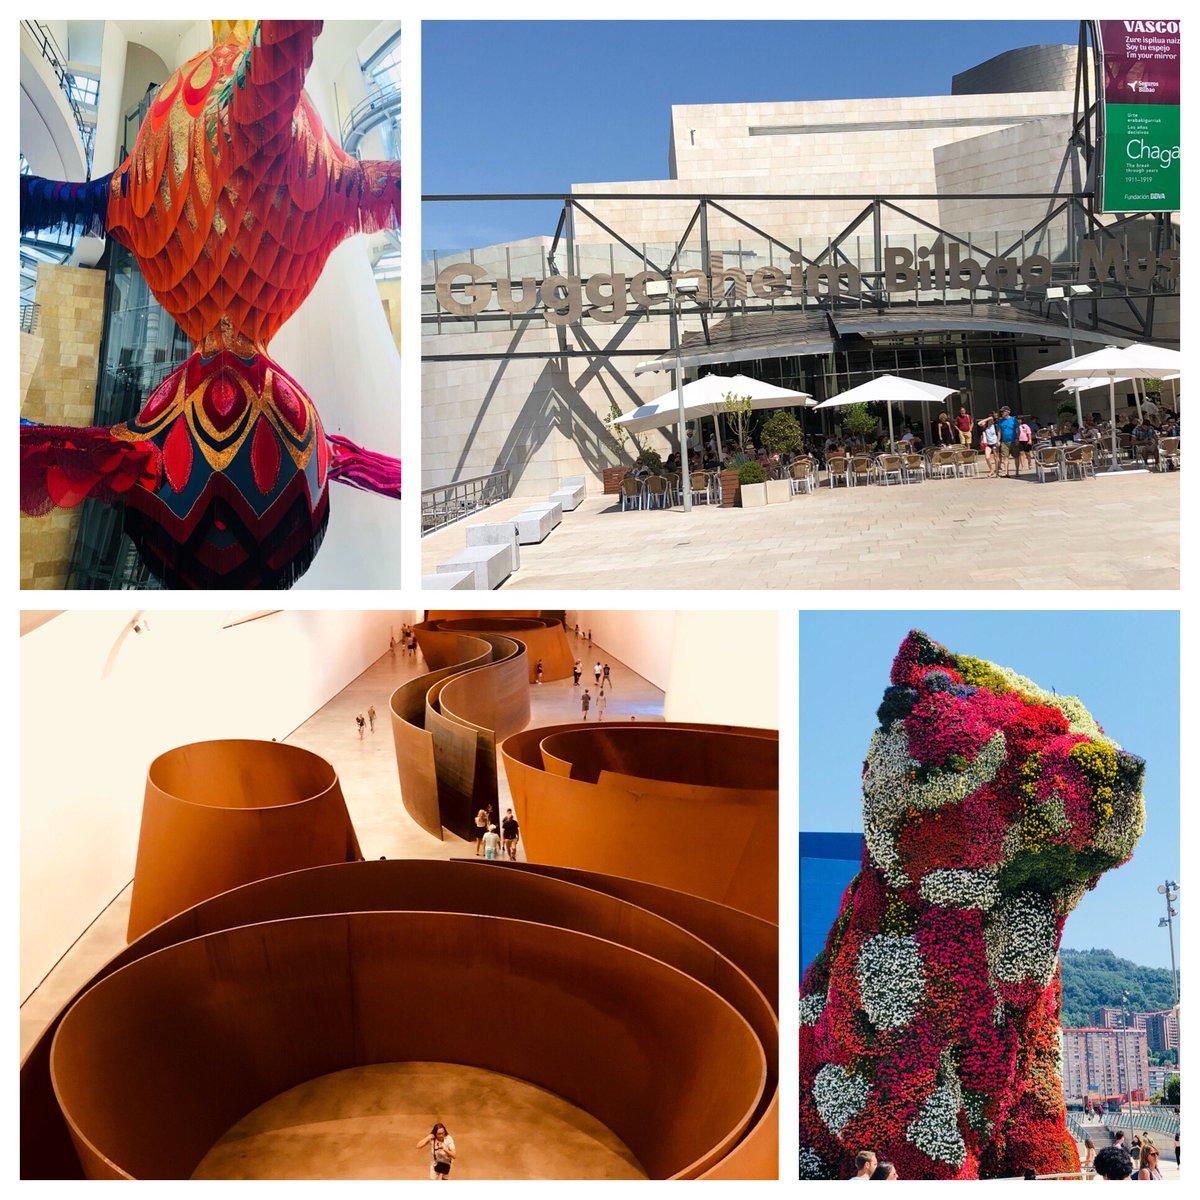 Today's adventure: Guggenheim Bilbao! https://t.co/bczHiwZoFl